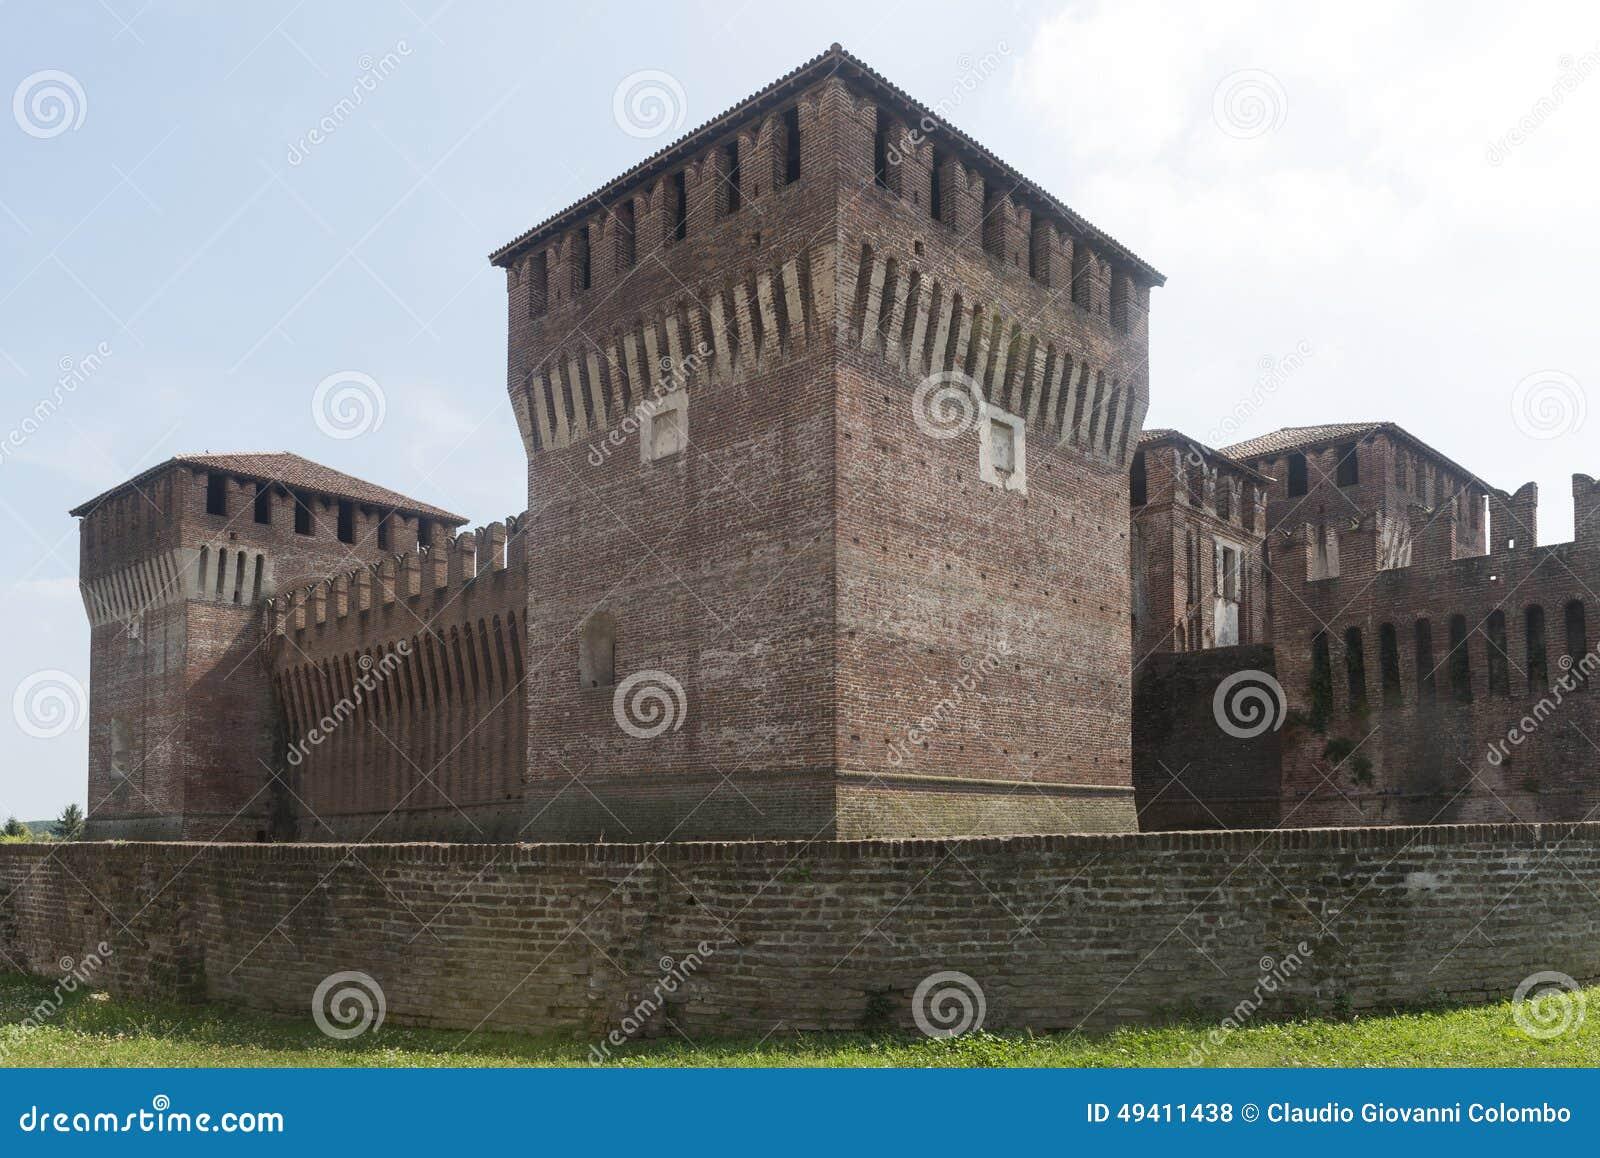 Download Soncino (Cremona, Italien) stockfoto. Bild von outdoor - 49411438